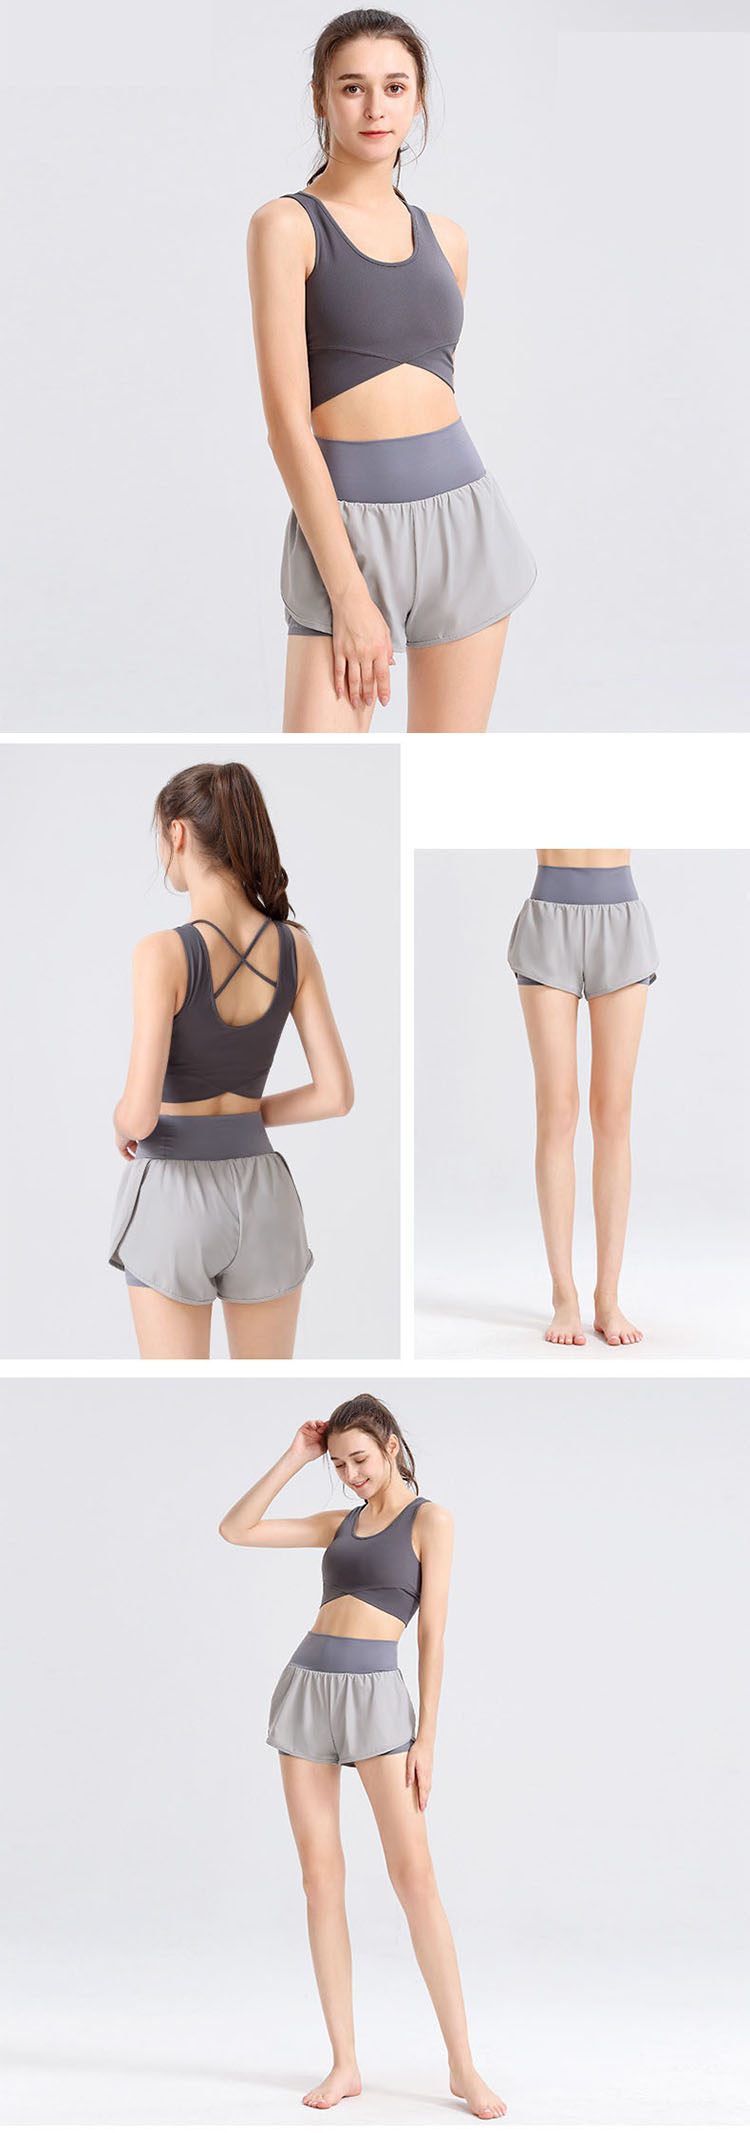 Cross beautiful back design, stylish and simple.